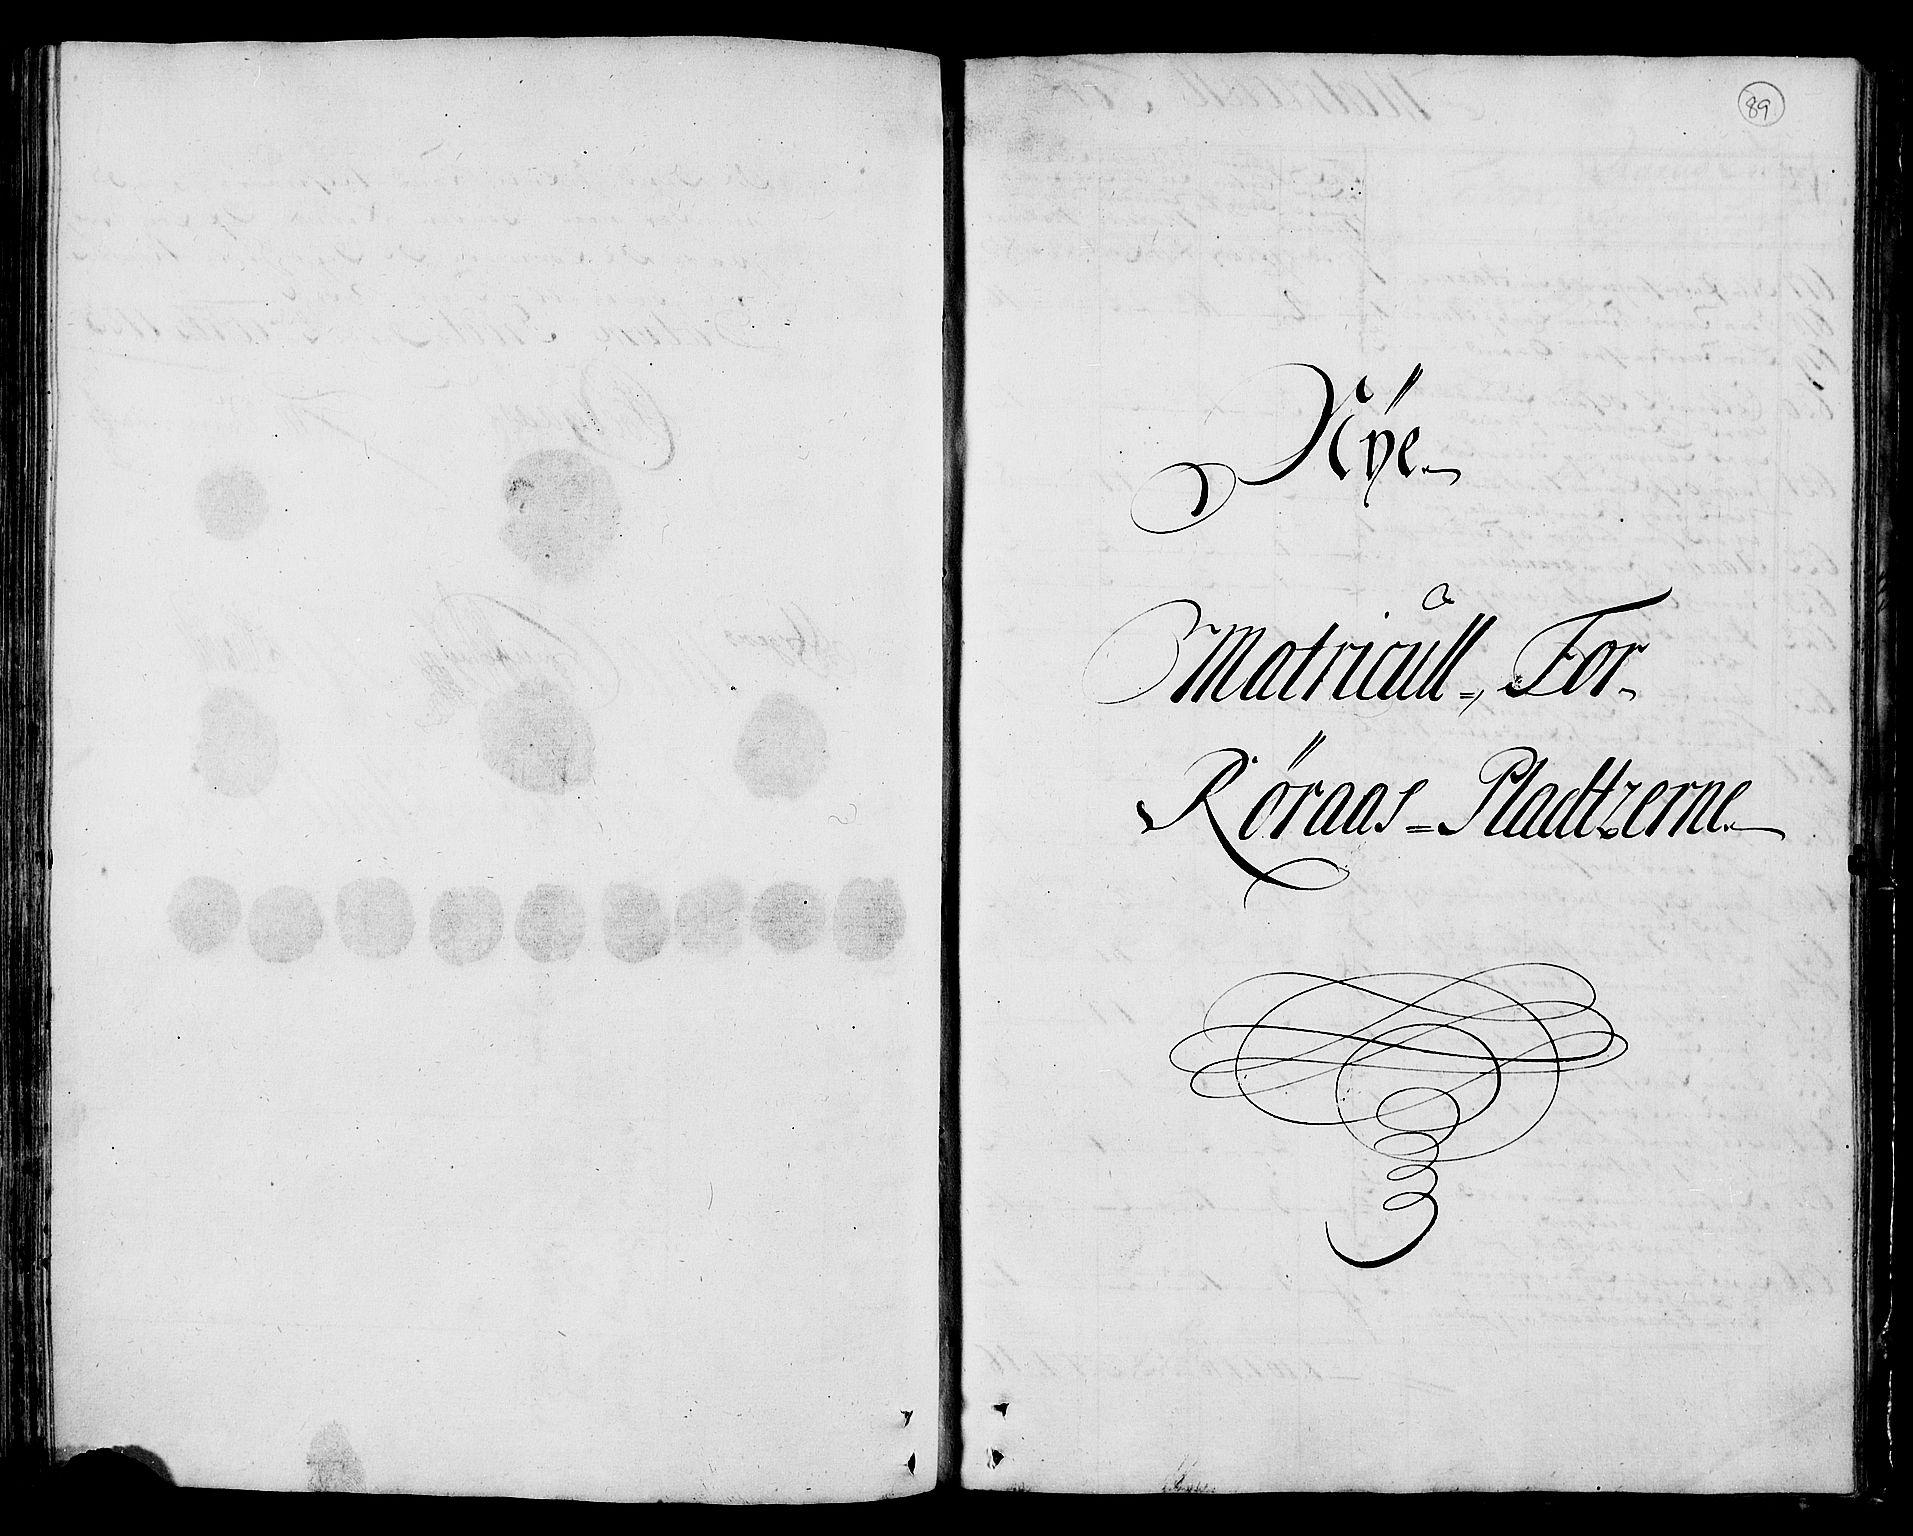 RA, Rentekammeret inntil 1814, Realistisk ordnet avdeling, N/Nb/Nbf/L0159: Gauldal matrikkelprotokoll, 1723, s. 88b-89a